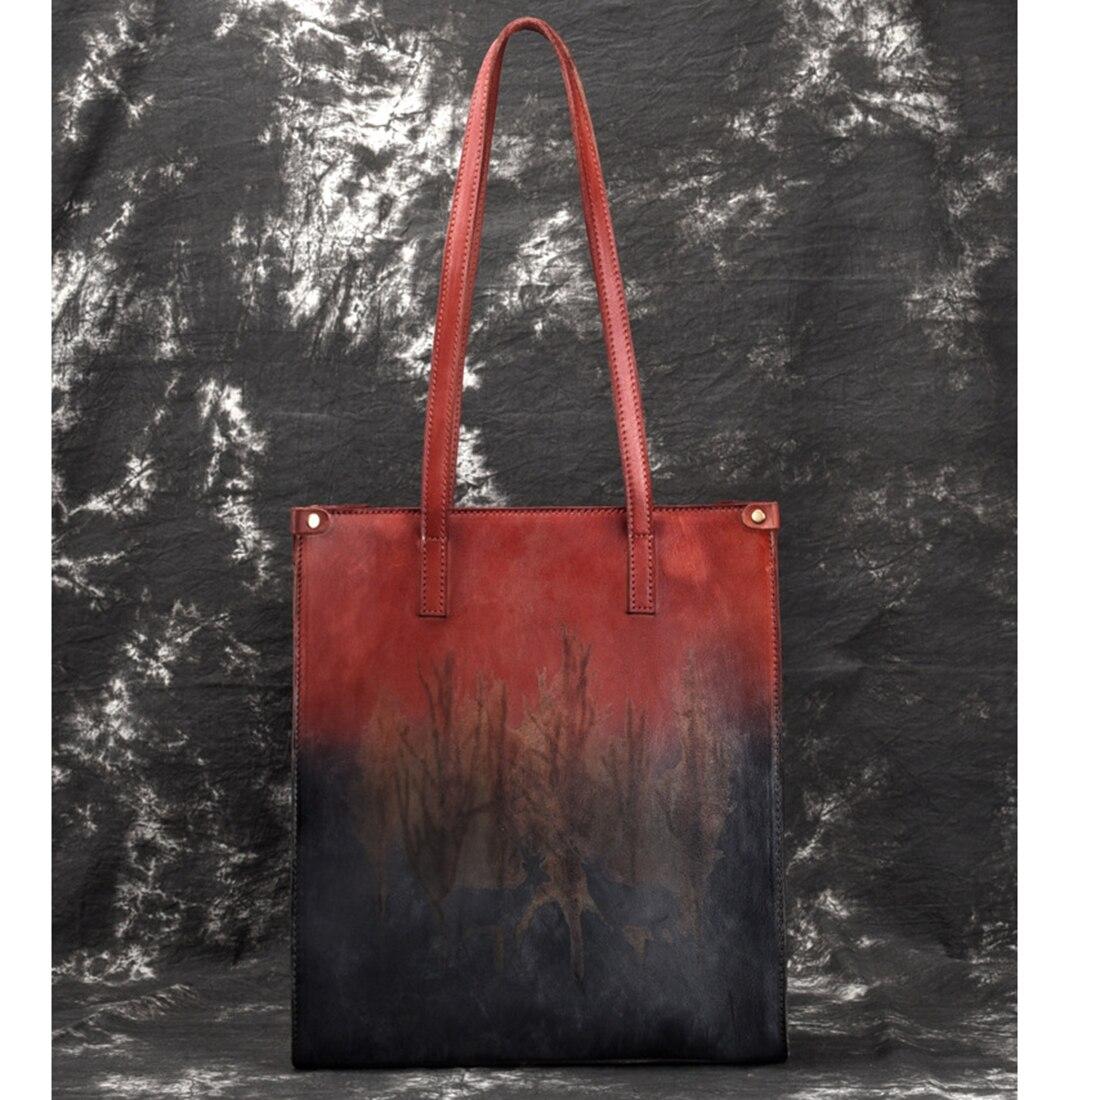 High Quality Genuine Leather Handbag Ladies Shopping Bags Deer Floral  Pattern Large Capacity Retro Natural 7d21ef45367ec